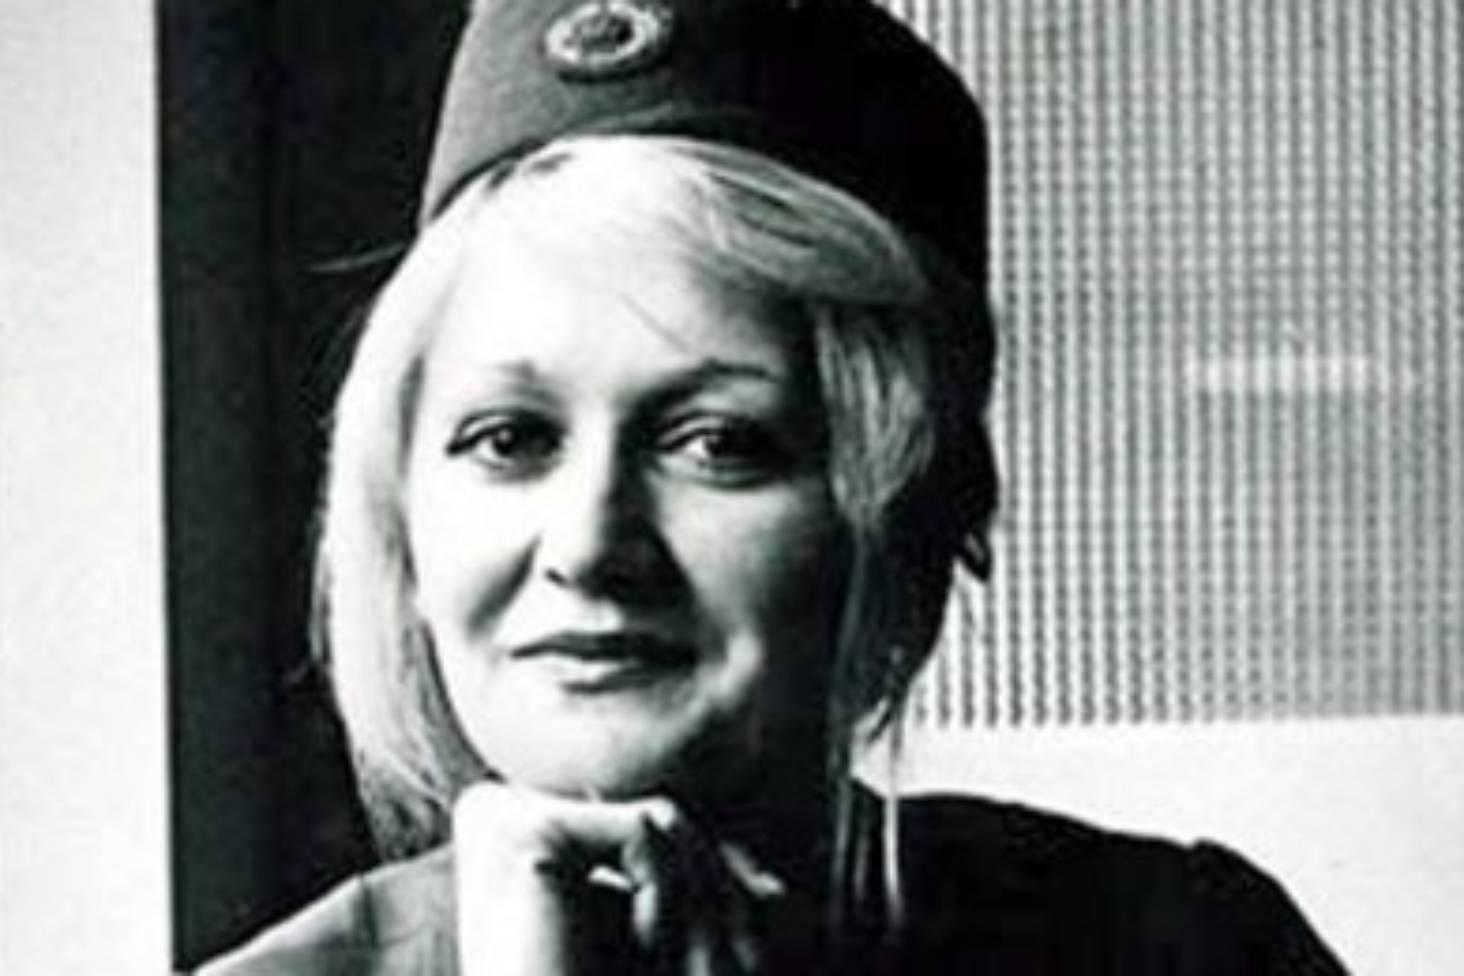 Stewardess Vesna Vulovich: biography, life history and interesting facts 82